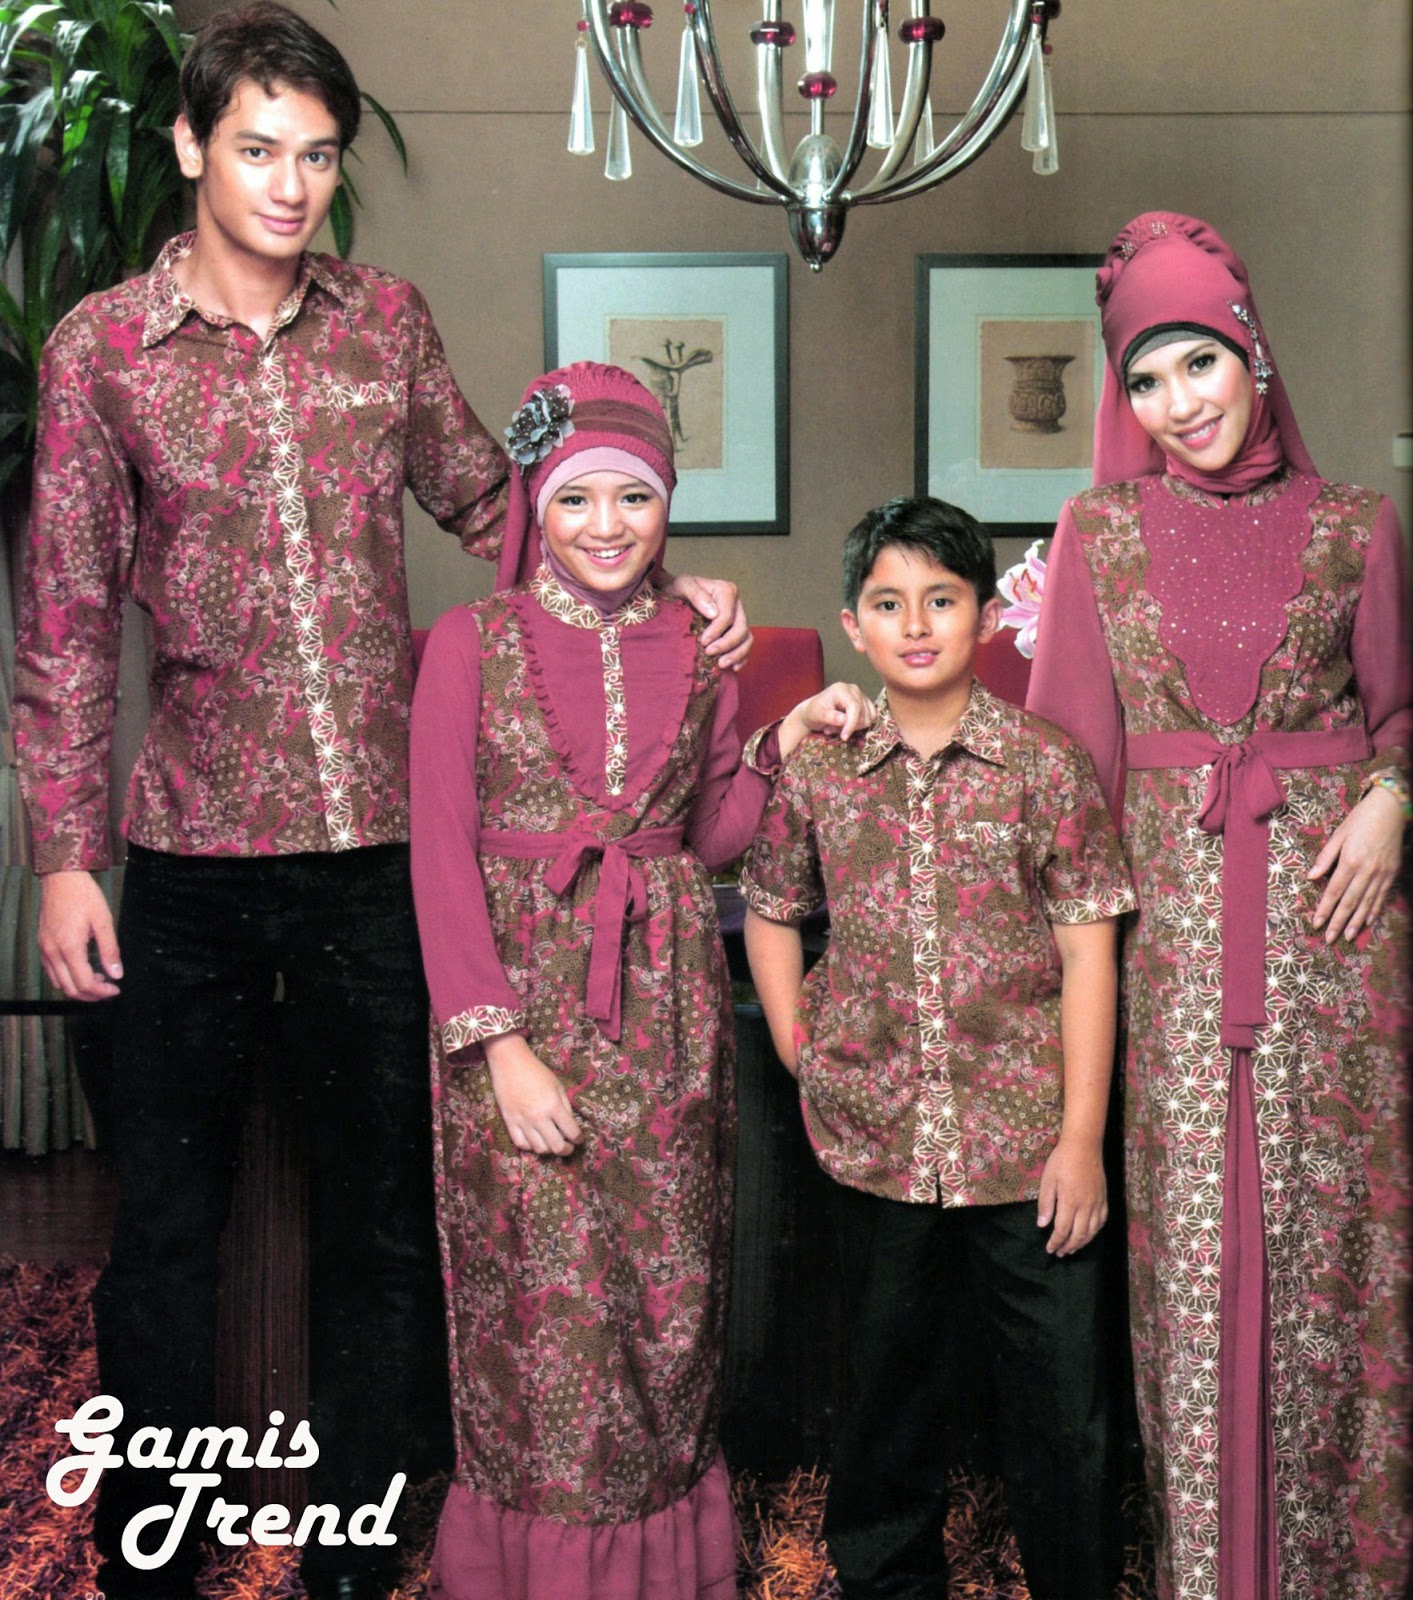 Pasangan Baju Pengantin Adat Toraja  - Payet Gaun Pesta